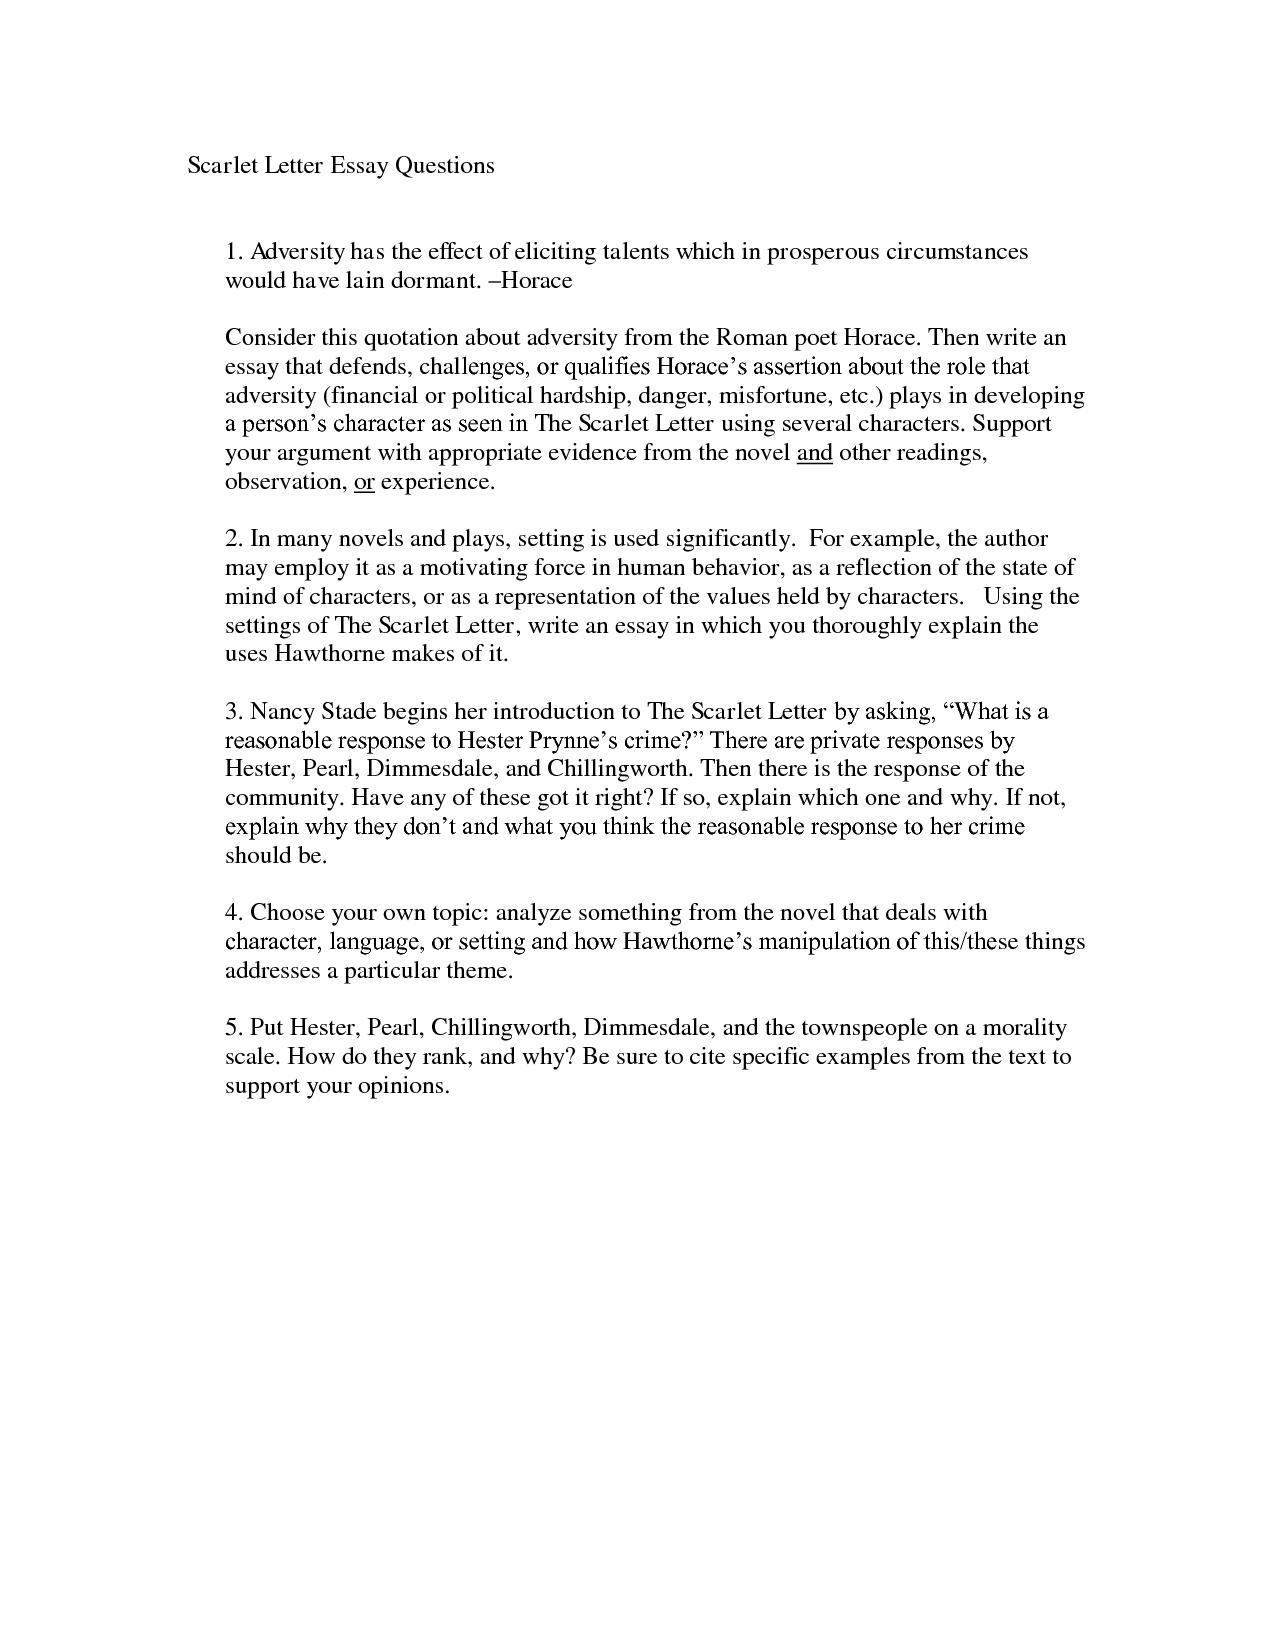 005 Scarlet Letter Essay Imposing Titles On Sin Pdf Full